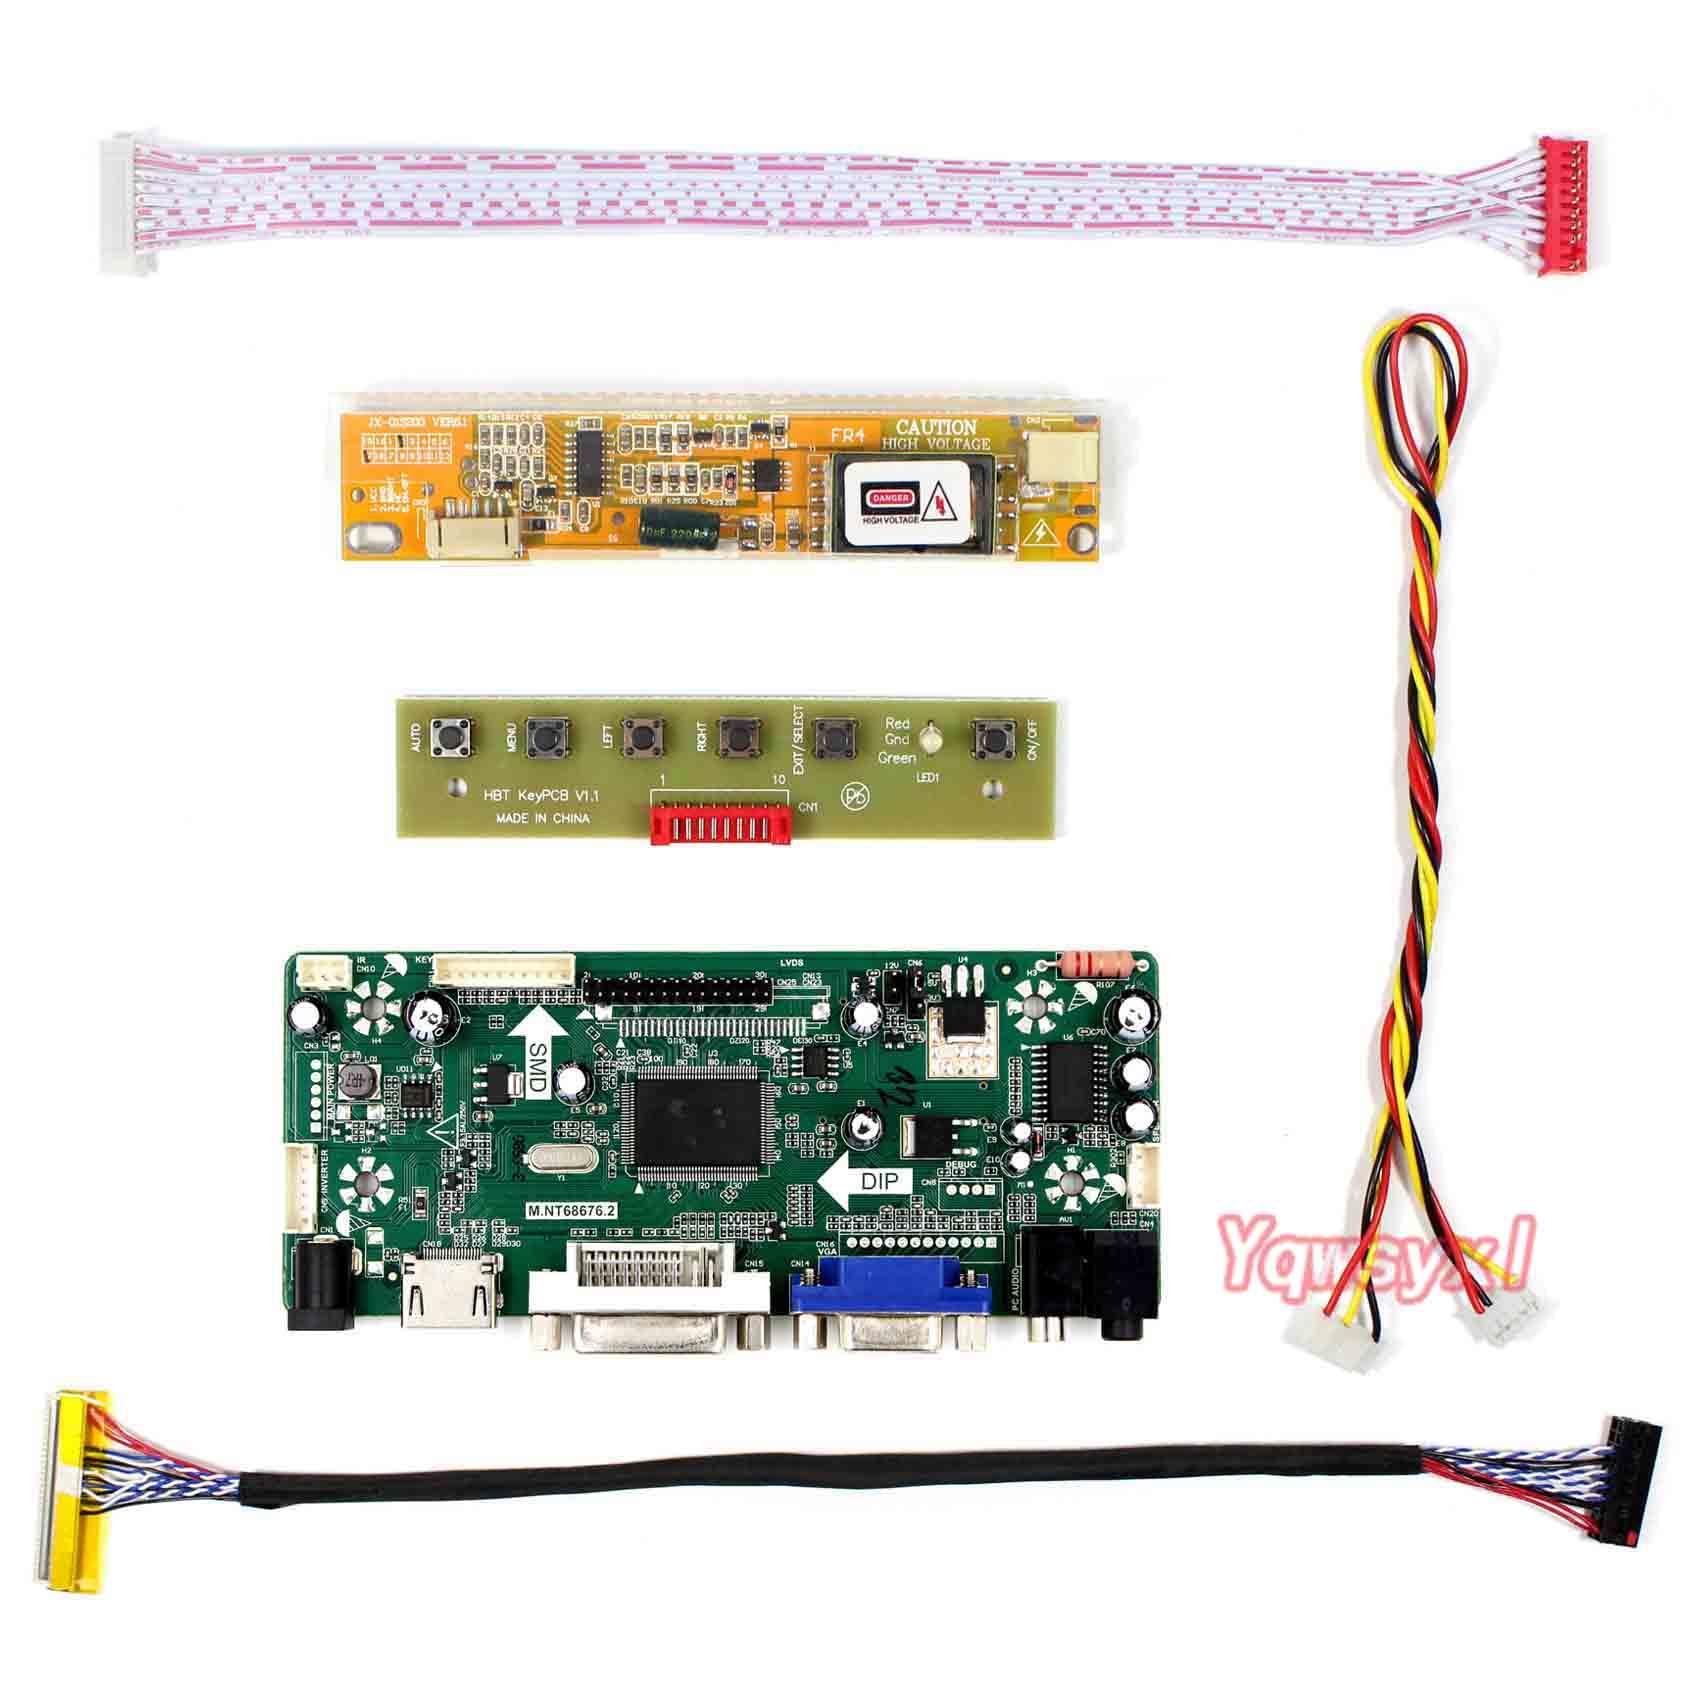 Yqwsyxl Control Board Monitor Kit For QD14XL20 HDMI + DVI + VGA LCD LED Screen Controller Board Driver